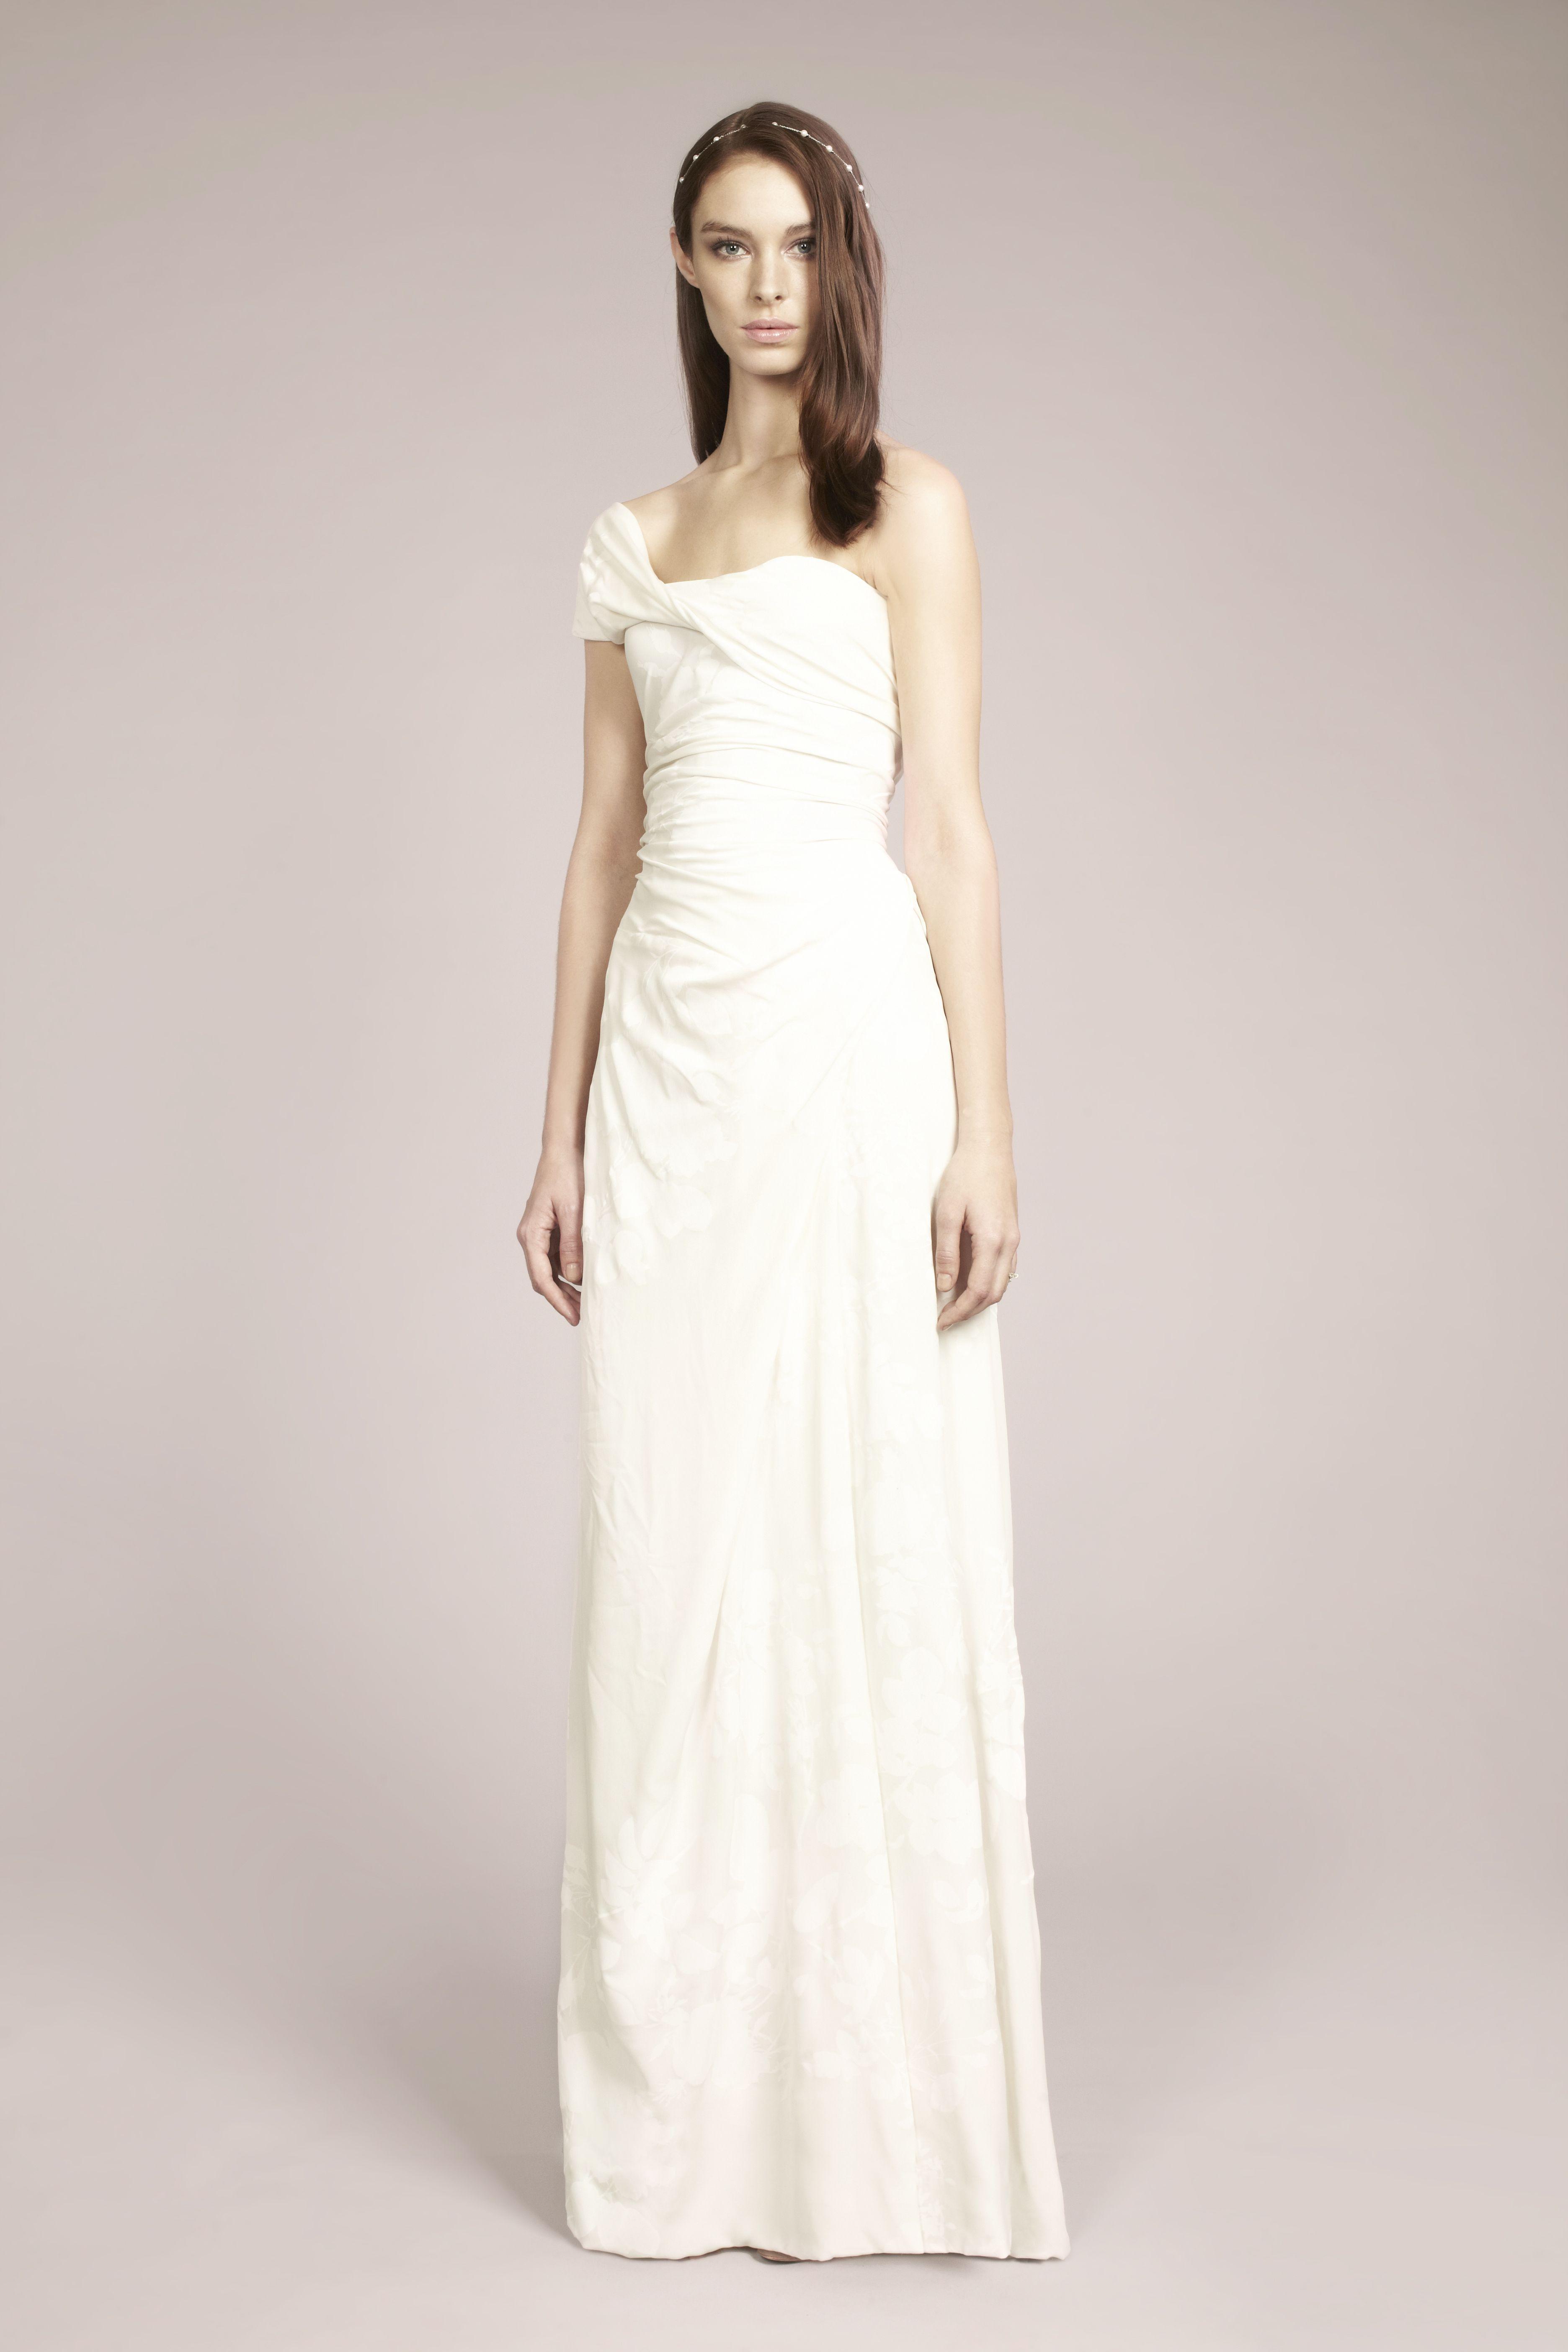 Vivienne Westwood Ready To Wear Long Glazing Dress Pretty Dresses Vivienne Westwood Bridal Urban Wedding Dress [ 5616 x 3744 Pixel ]